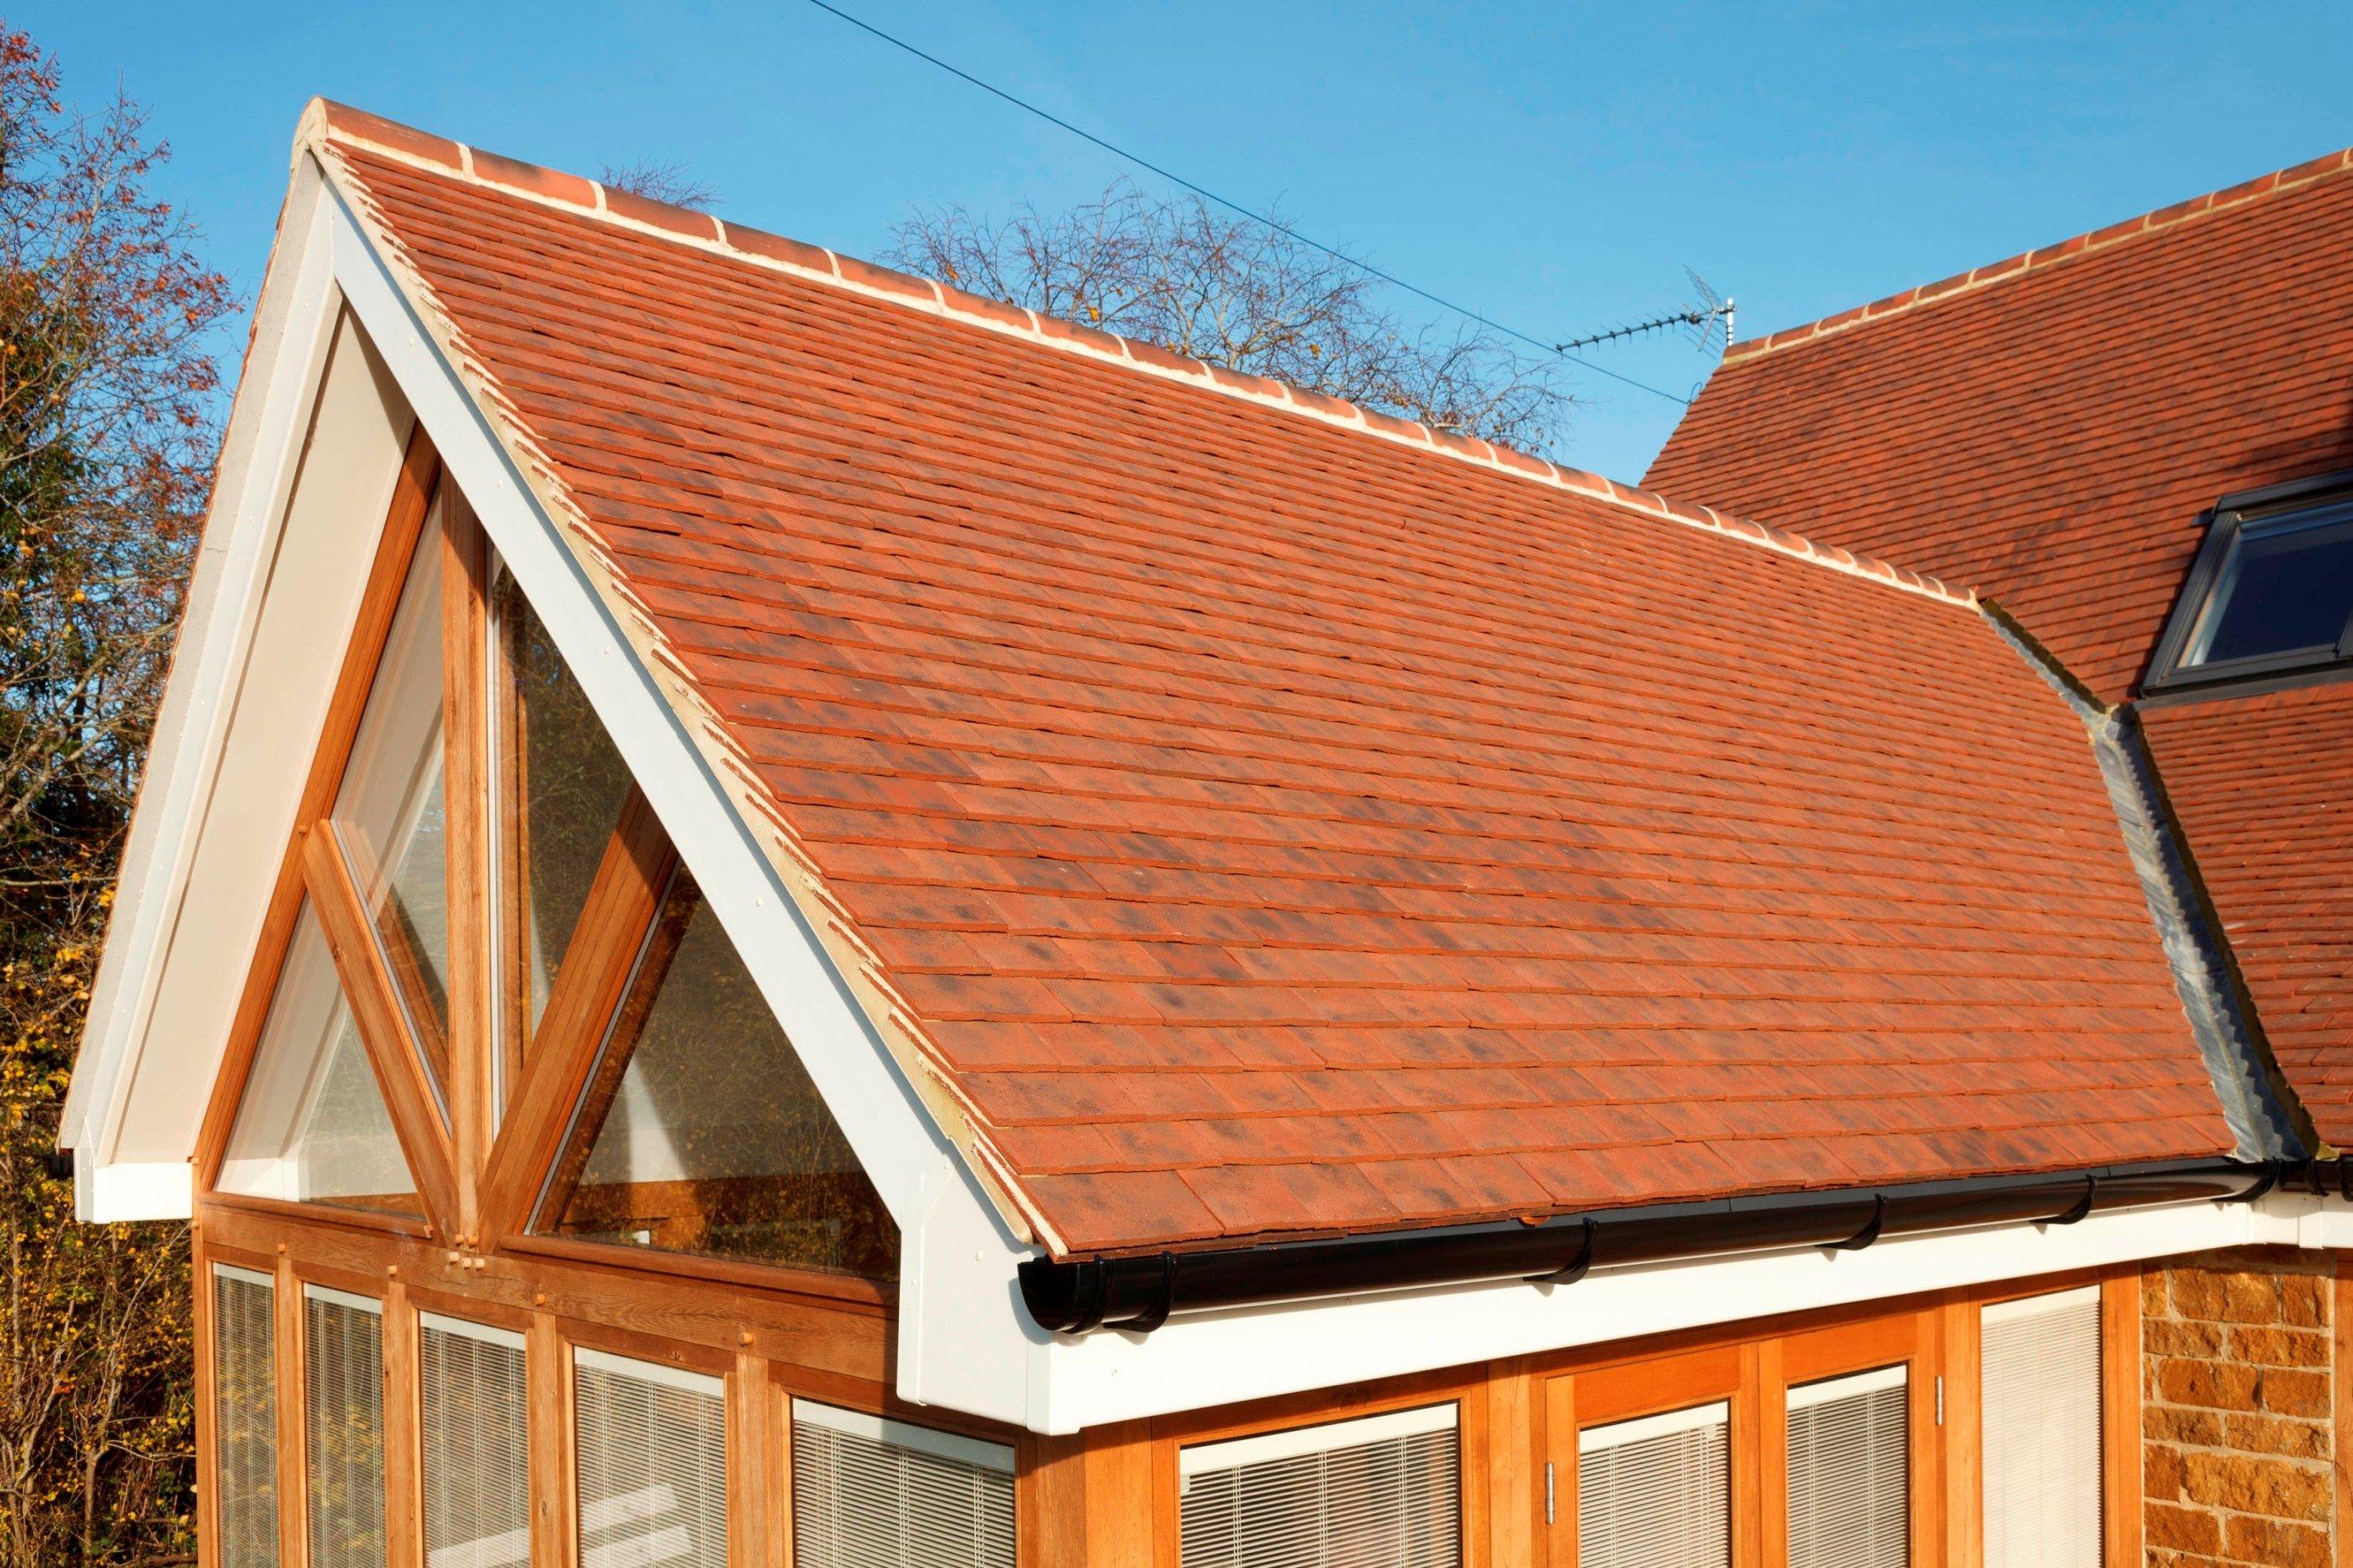 Redland Craftsman Albury Crowns Eco Home With Period Twist